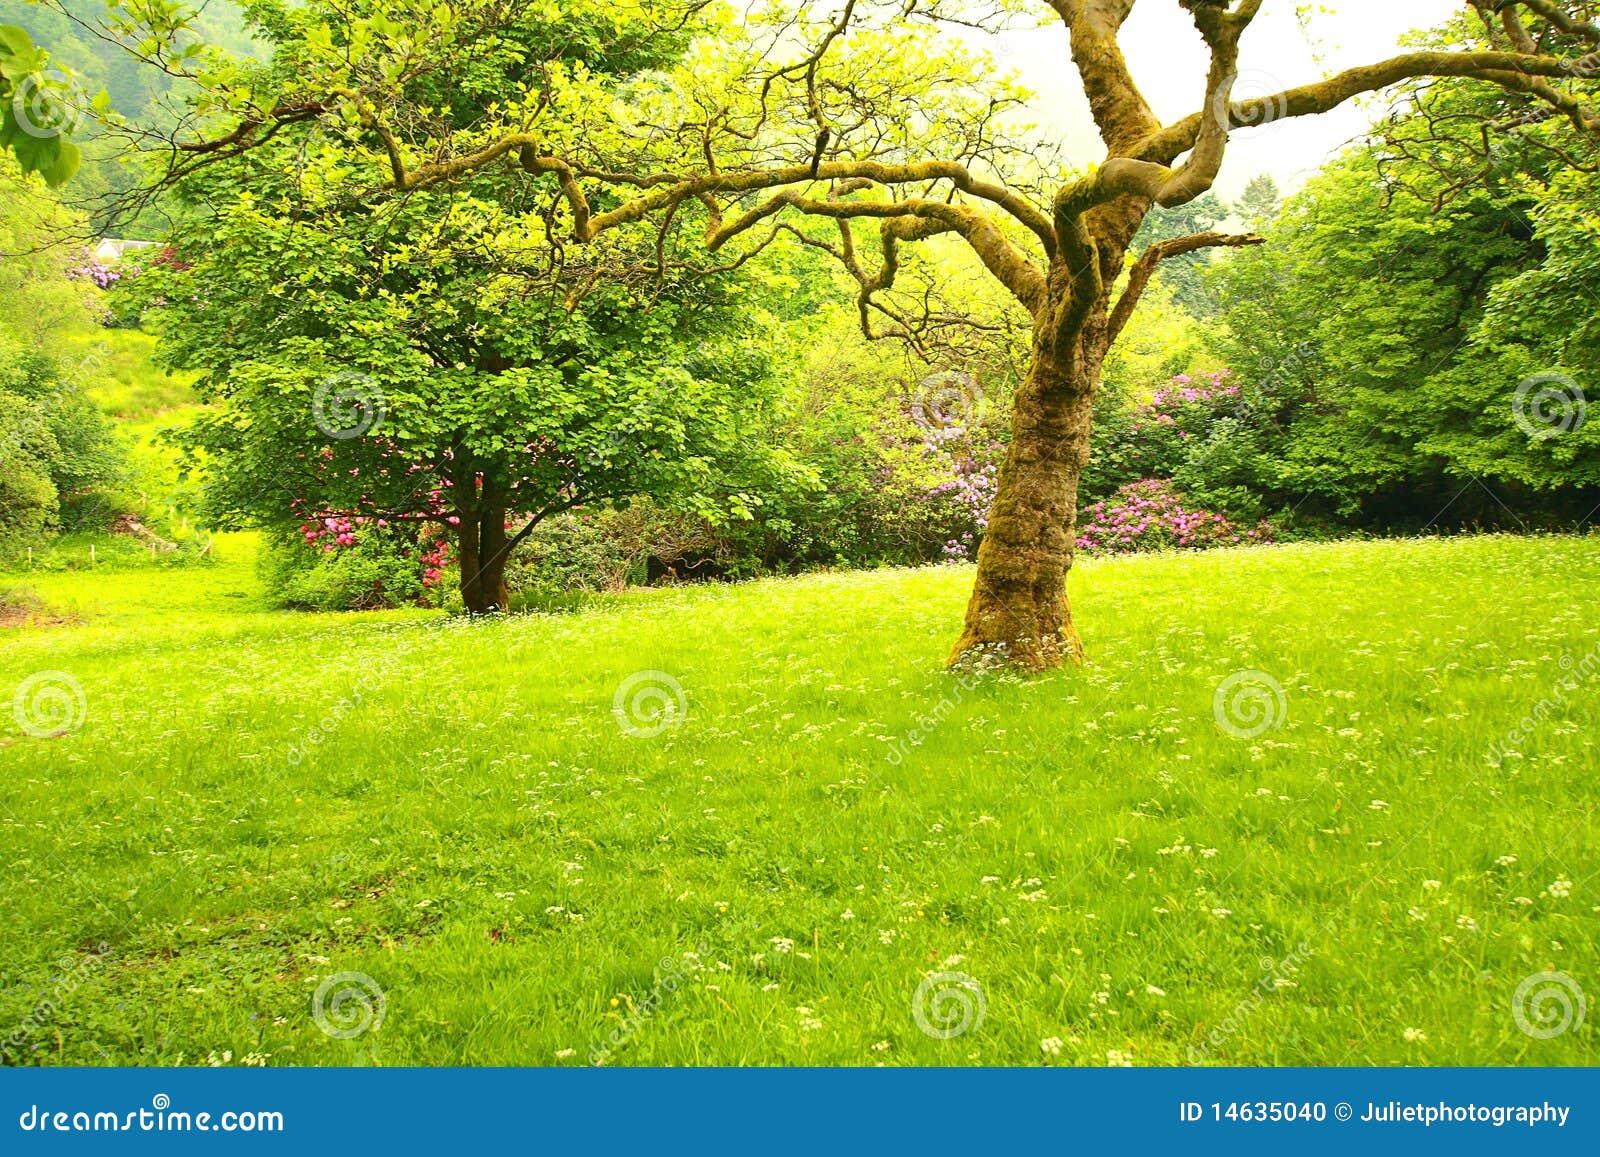 Wonderful spring garden 2 stock photo image 14635040 for Garden trees scotland